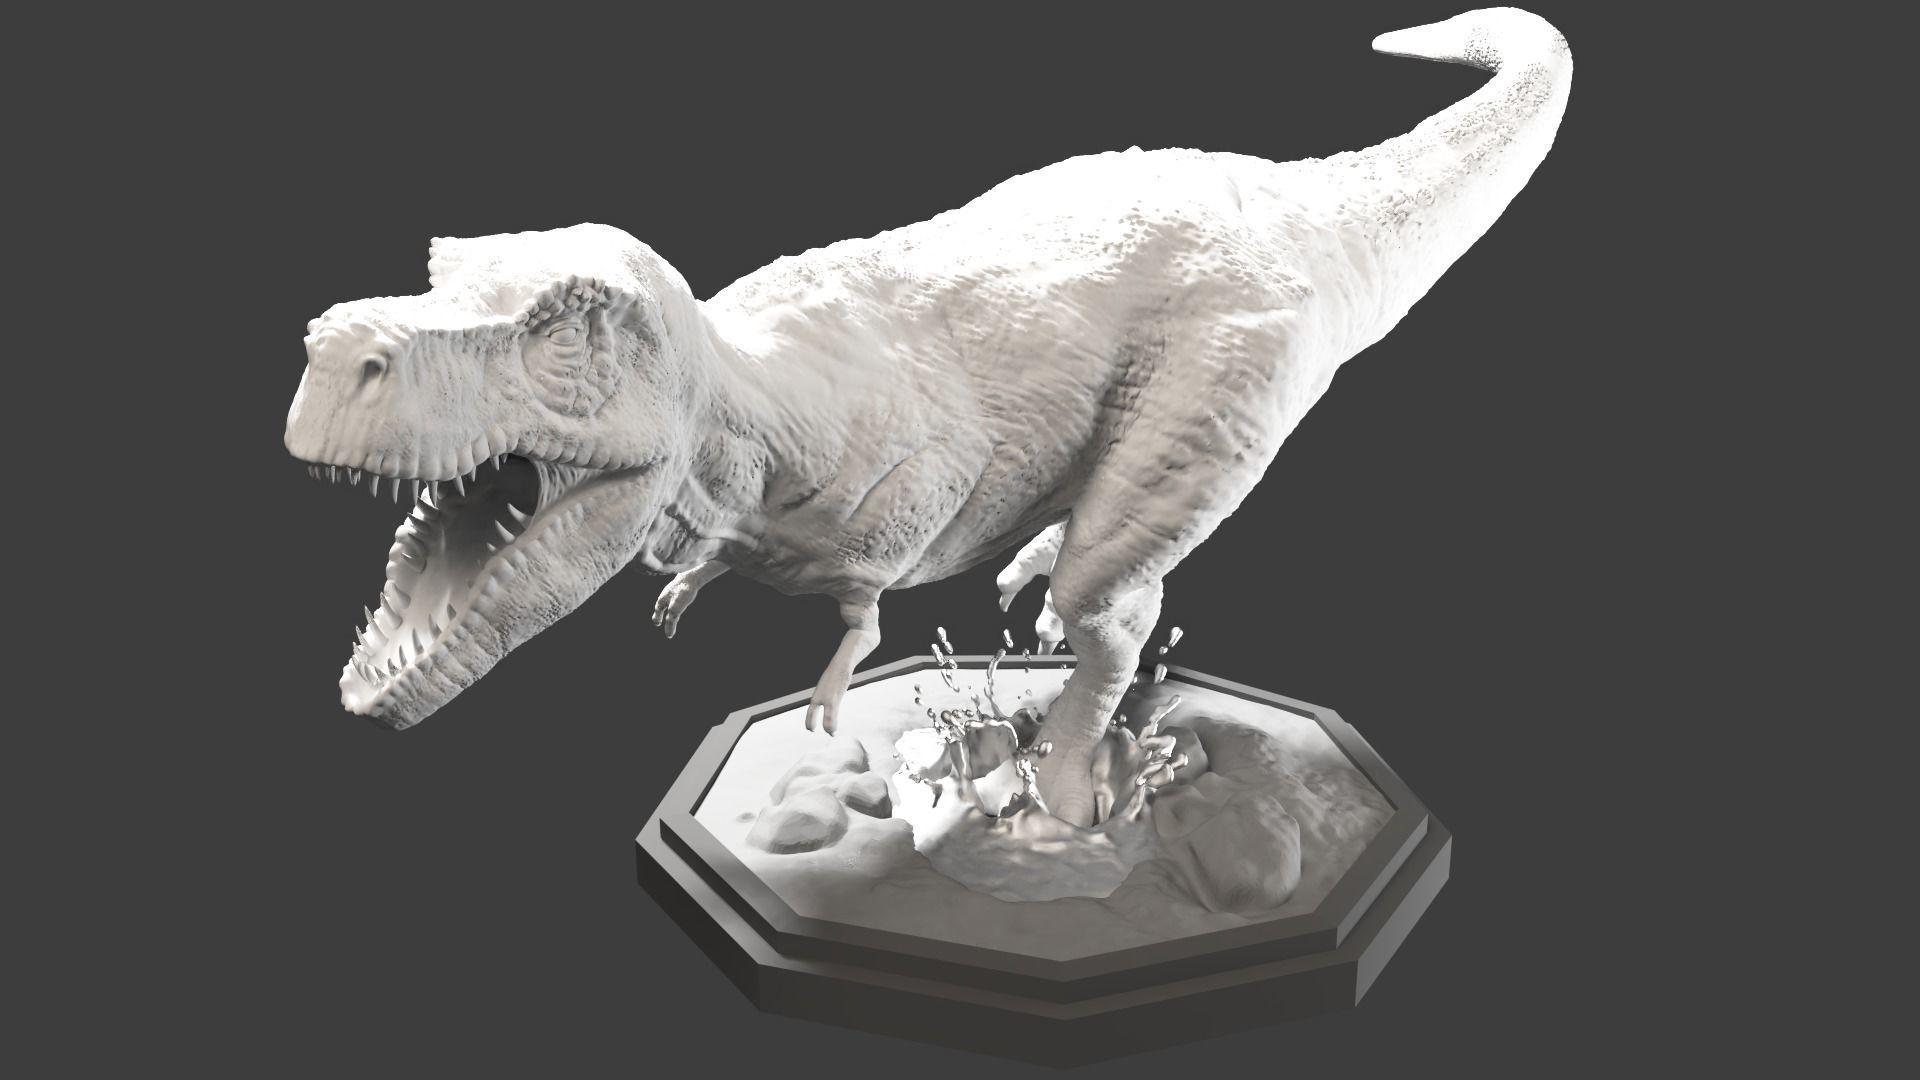 Tryannosaur